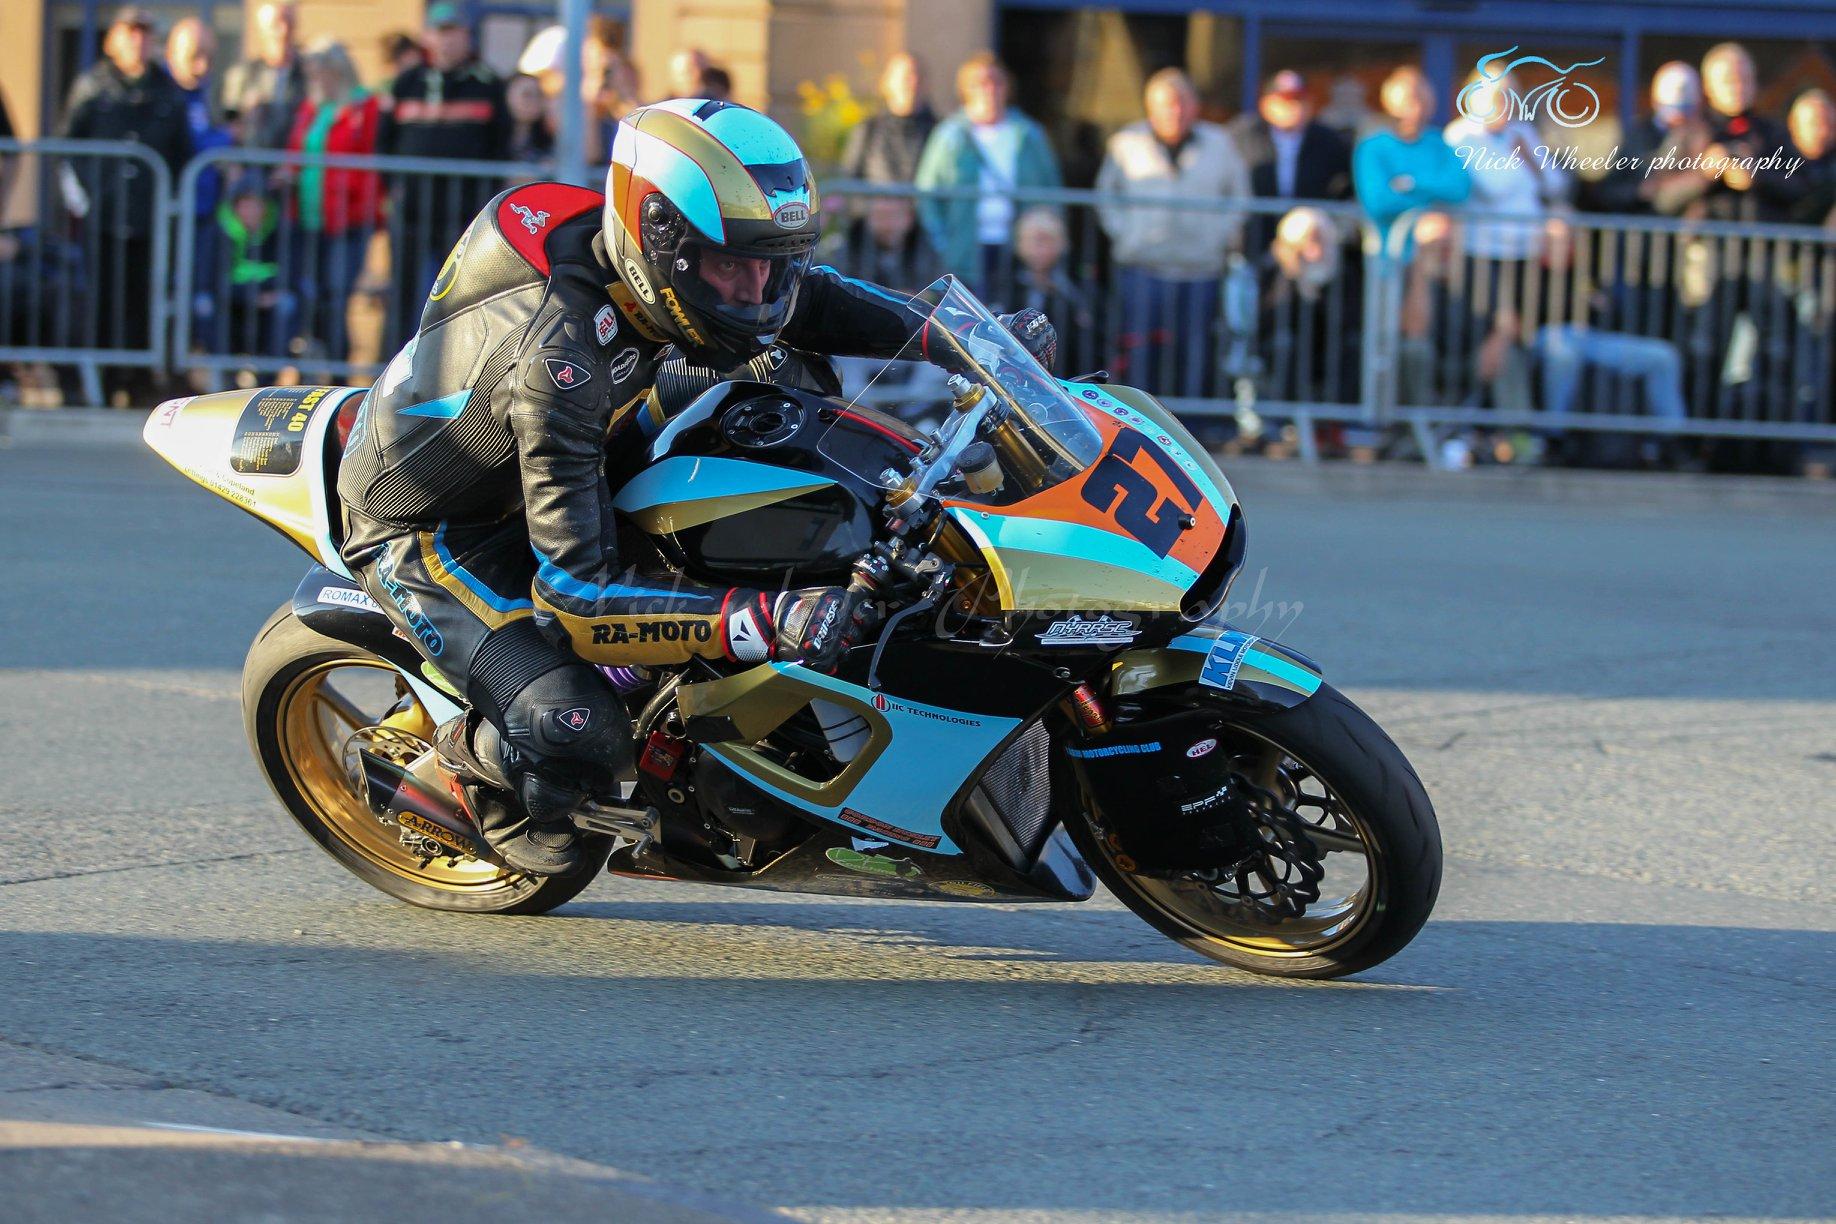 Fowler Confirms Third Manx GP Expedition